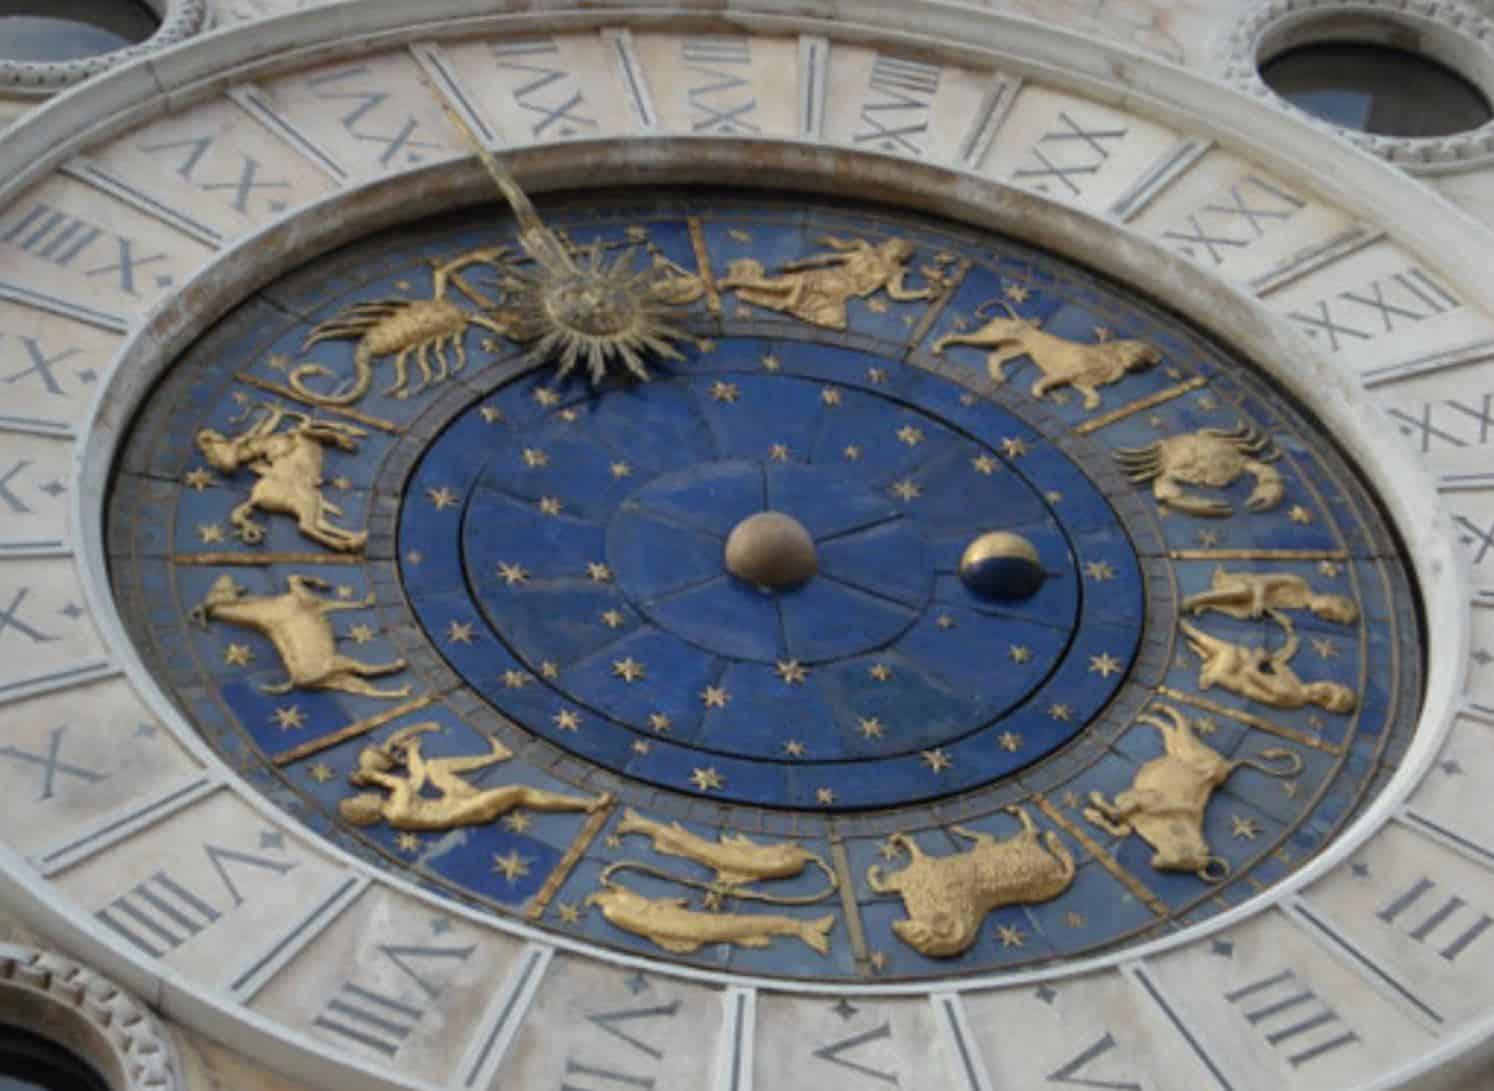 Astrologische Uhr Uhrenturm Markusplatz in Venedig